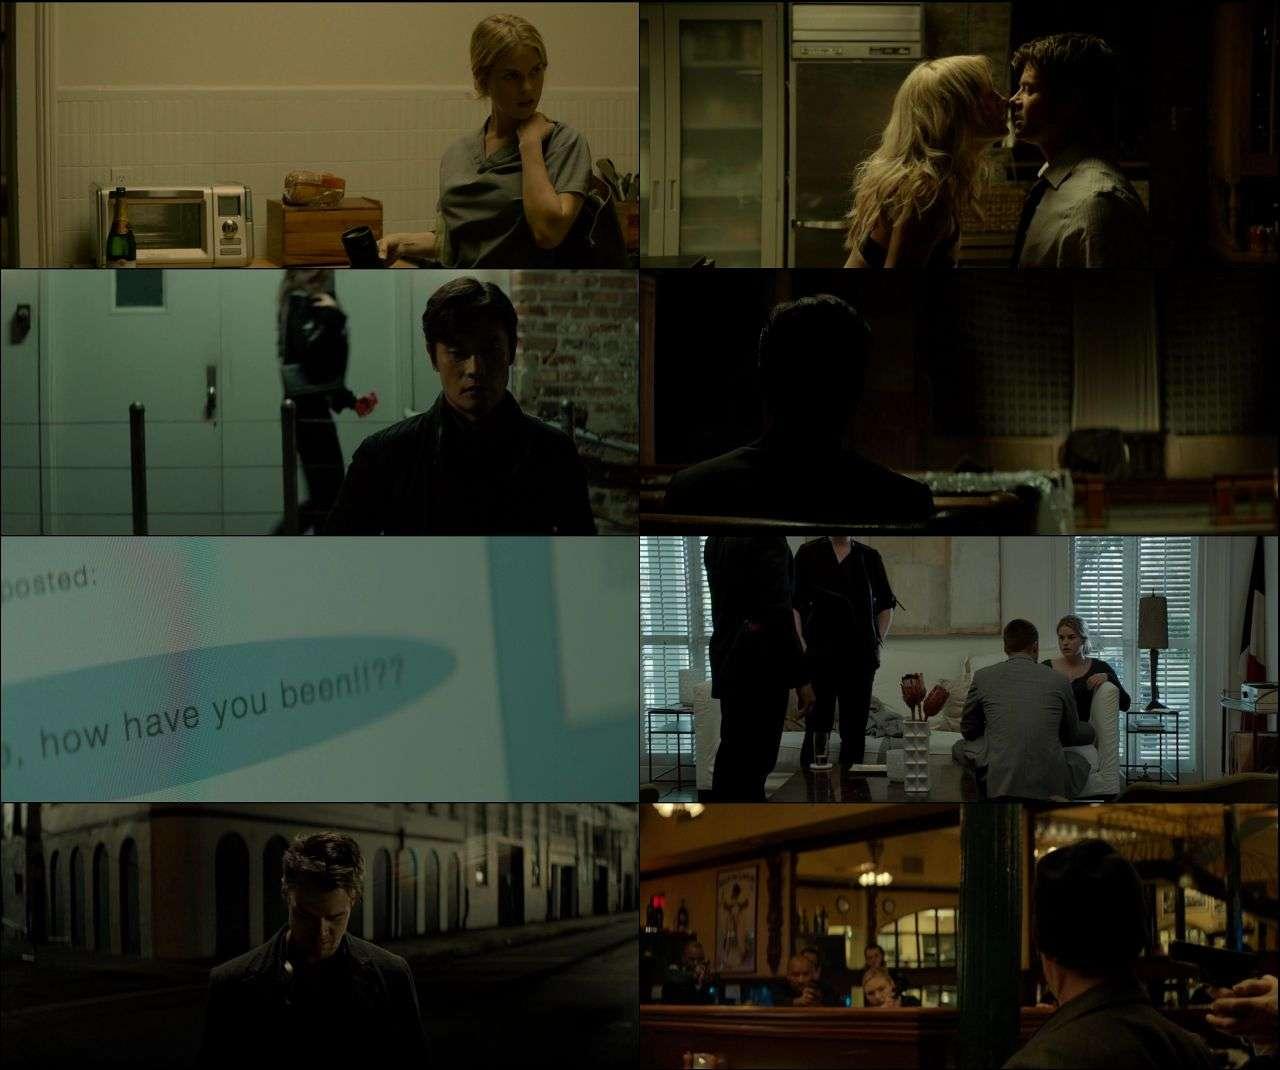 Hesaplaşma - Misconduct (2016) türkçe dublaj hd film indir